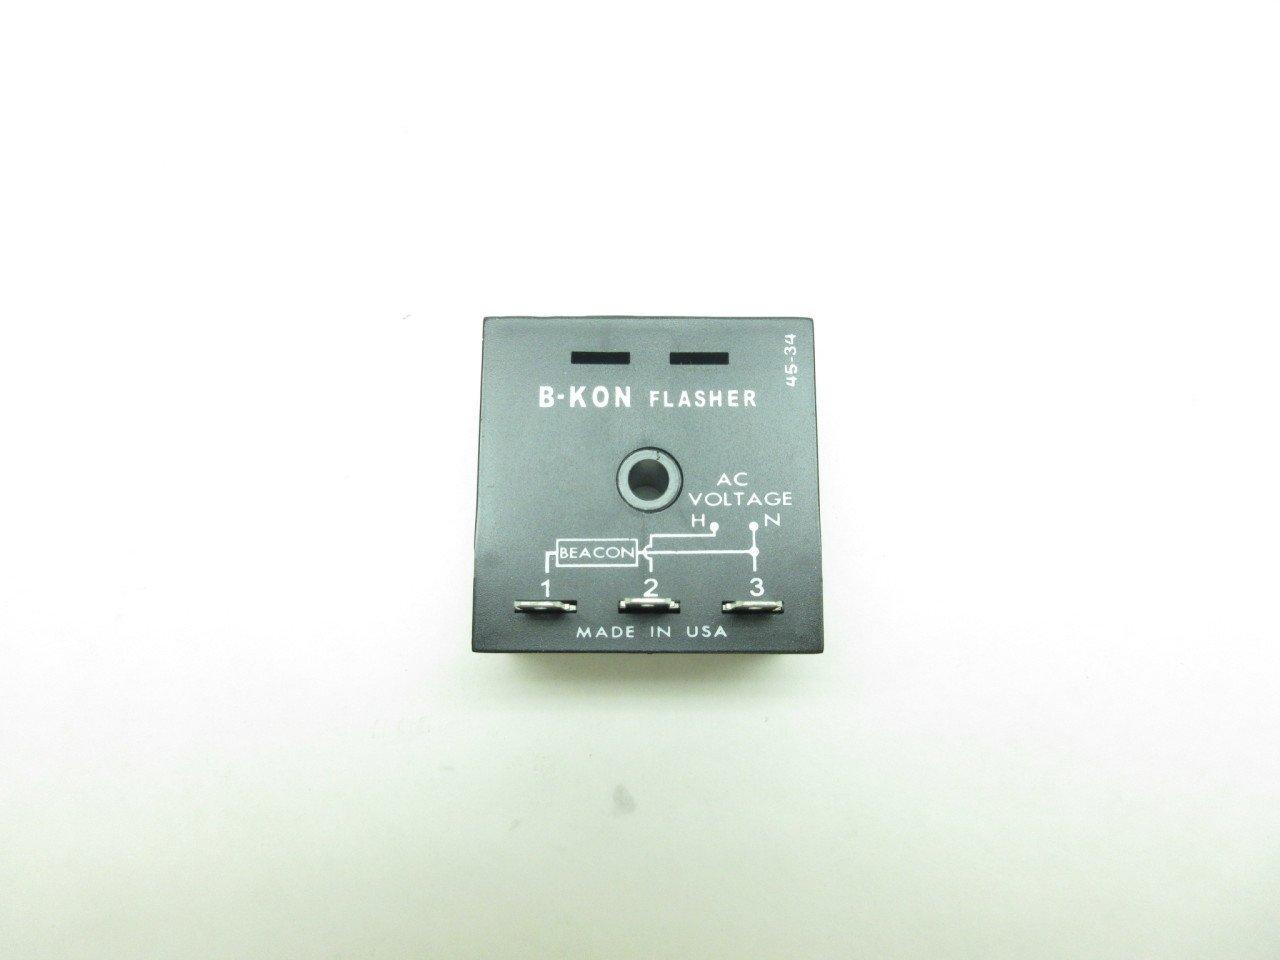 120v Flasher Simple Ac Light Bulb Abb Kon Beacon Tower Ssac Relay Industrial Scientific 1280x960